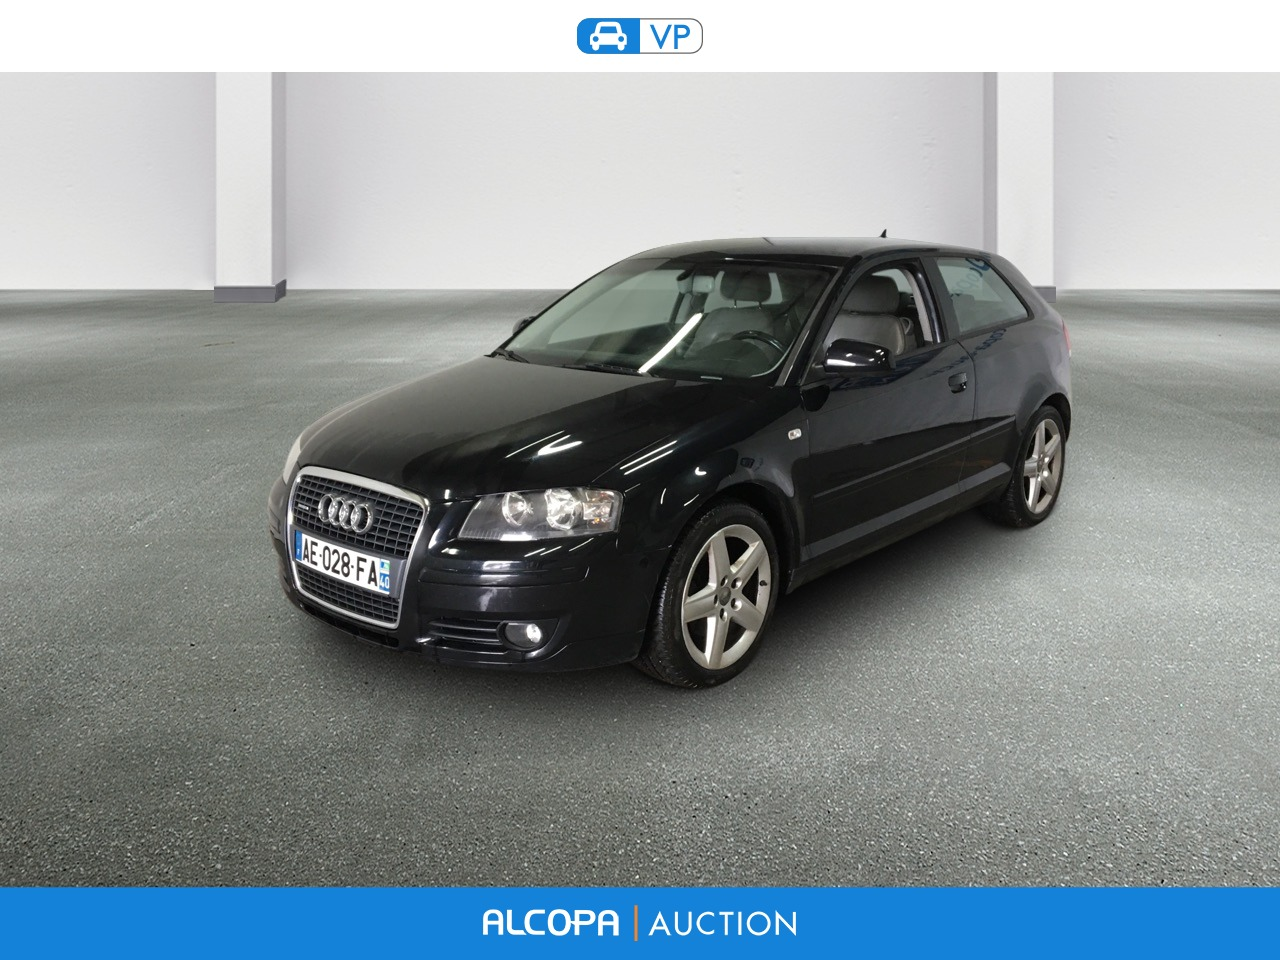 Audi A3 052005 042008 A3 20 Tdi Quattro Ambition Luxe